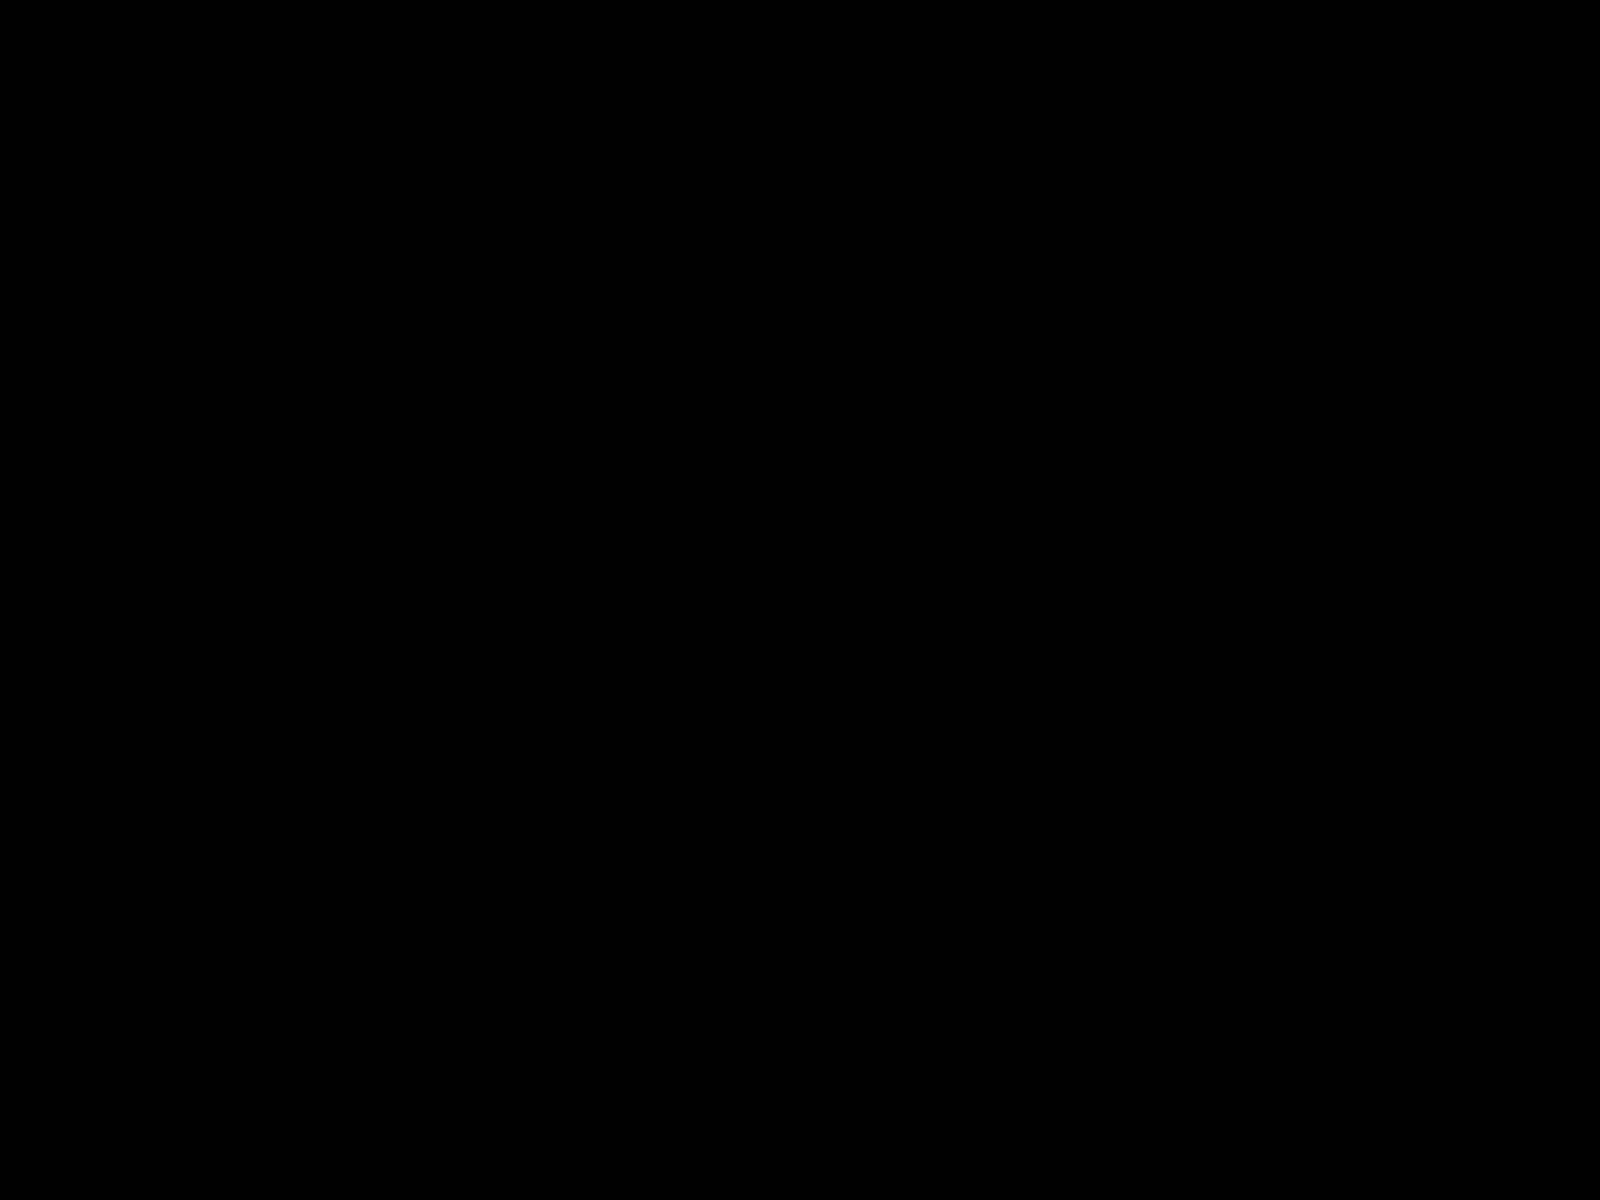 matlab code svm image classification yu0J30